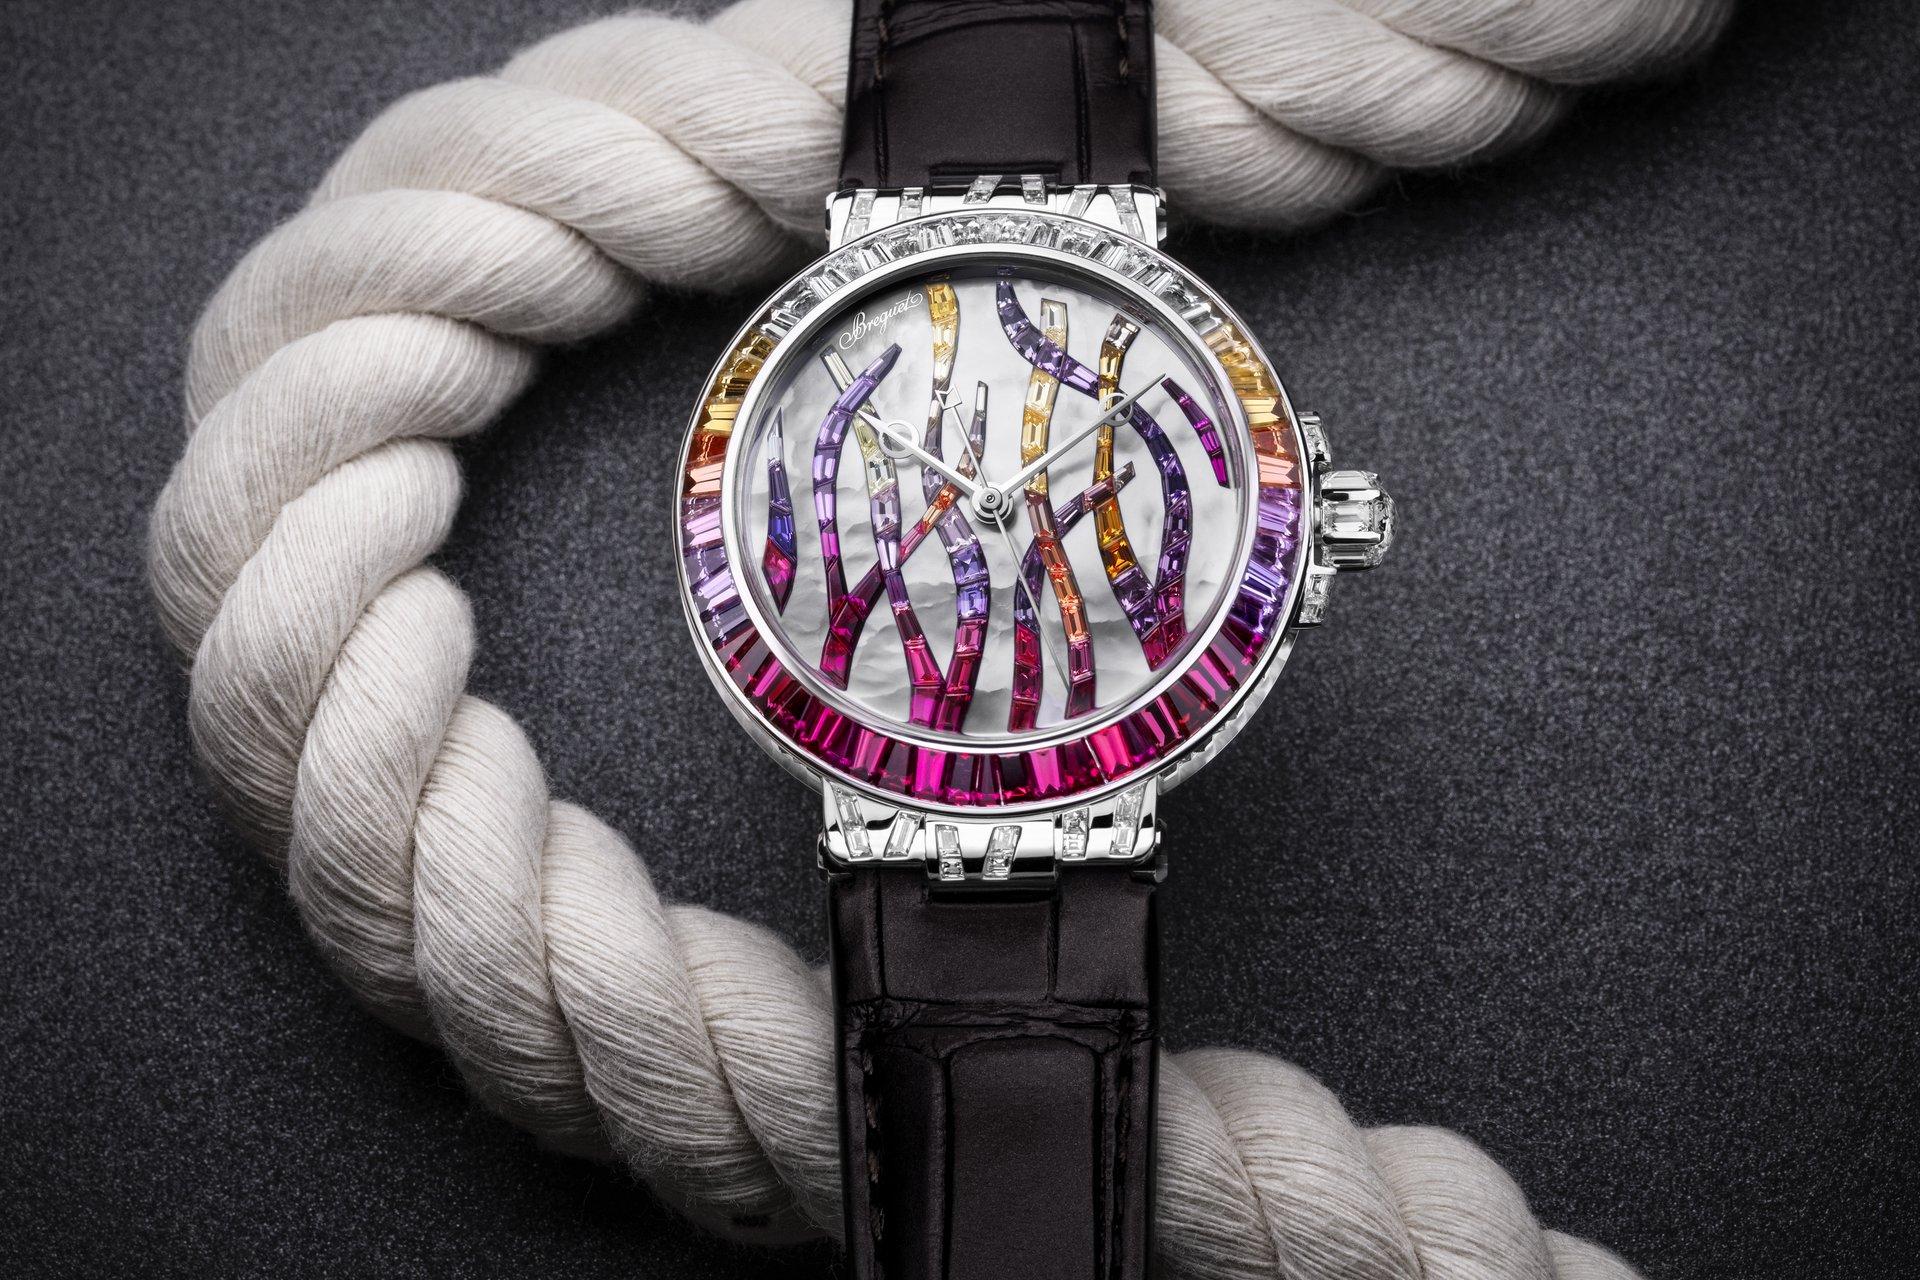 , Marine Haute Joaillerie Poseidonia Watches – dwelling in oceanic beauty., Saubio Making Wealth